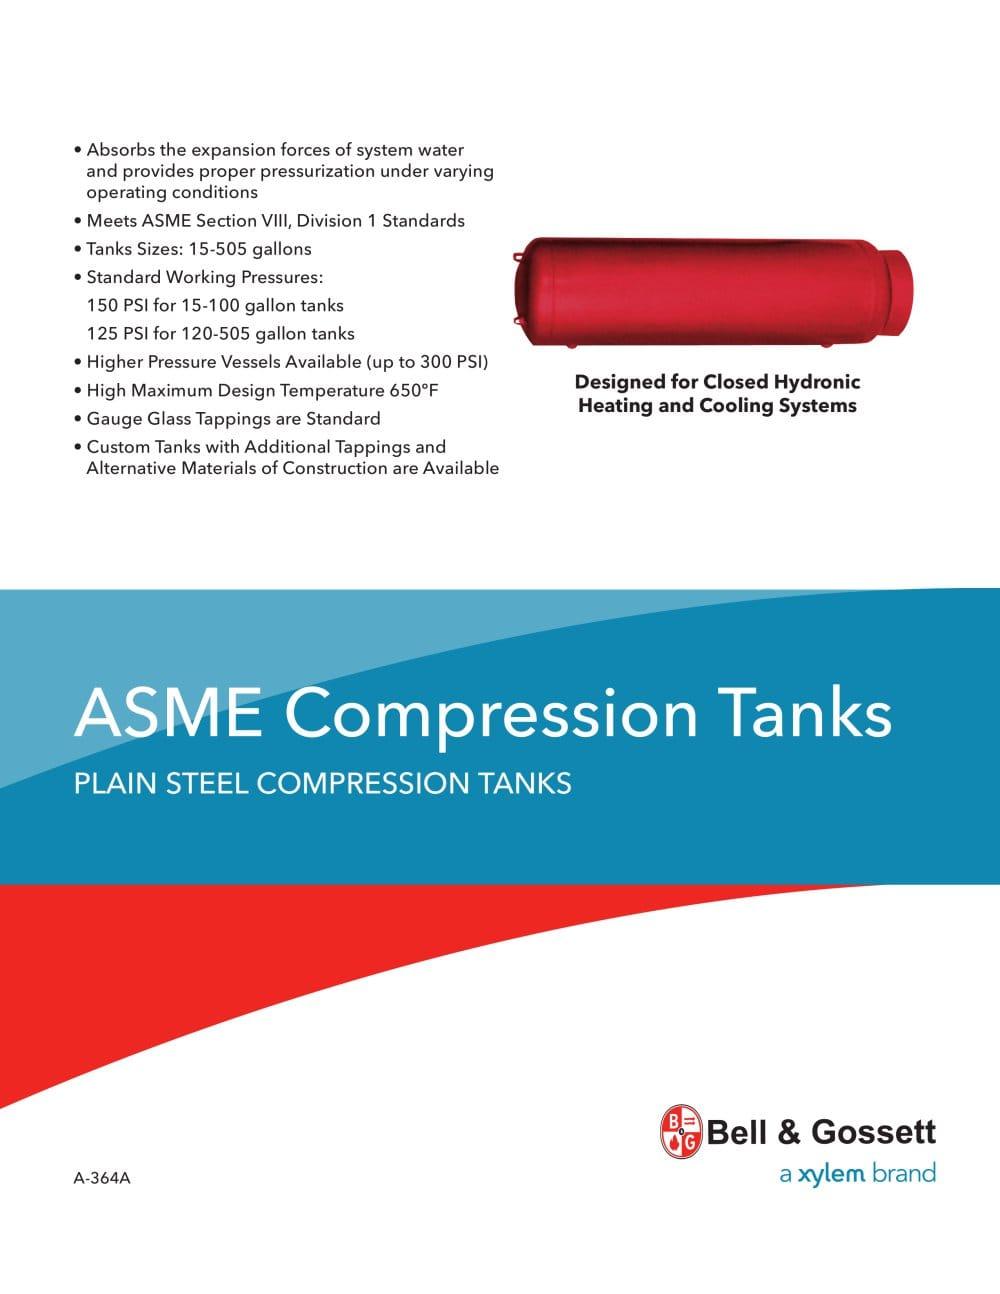 ASME Compression Tanks - Bell & Gossett Domestic Pump - PDF ...